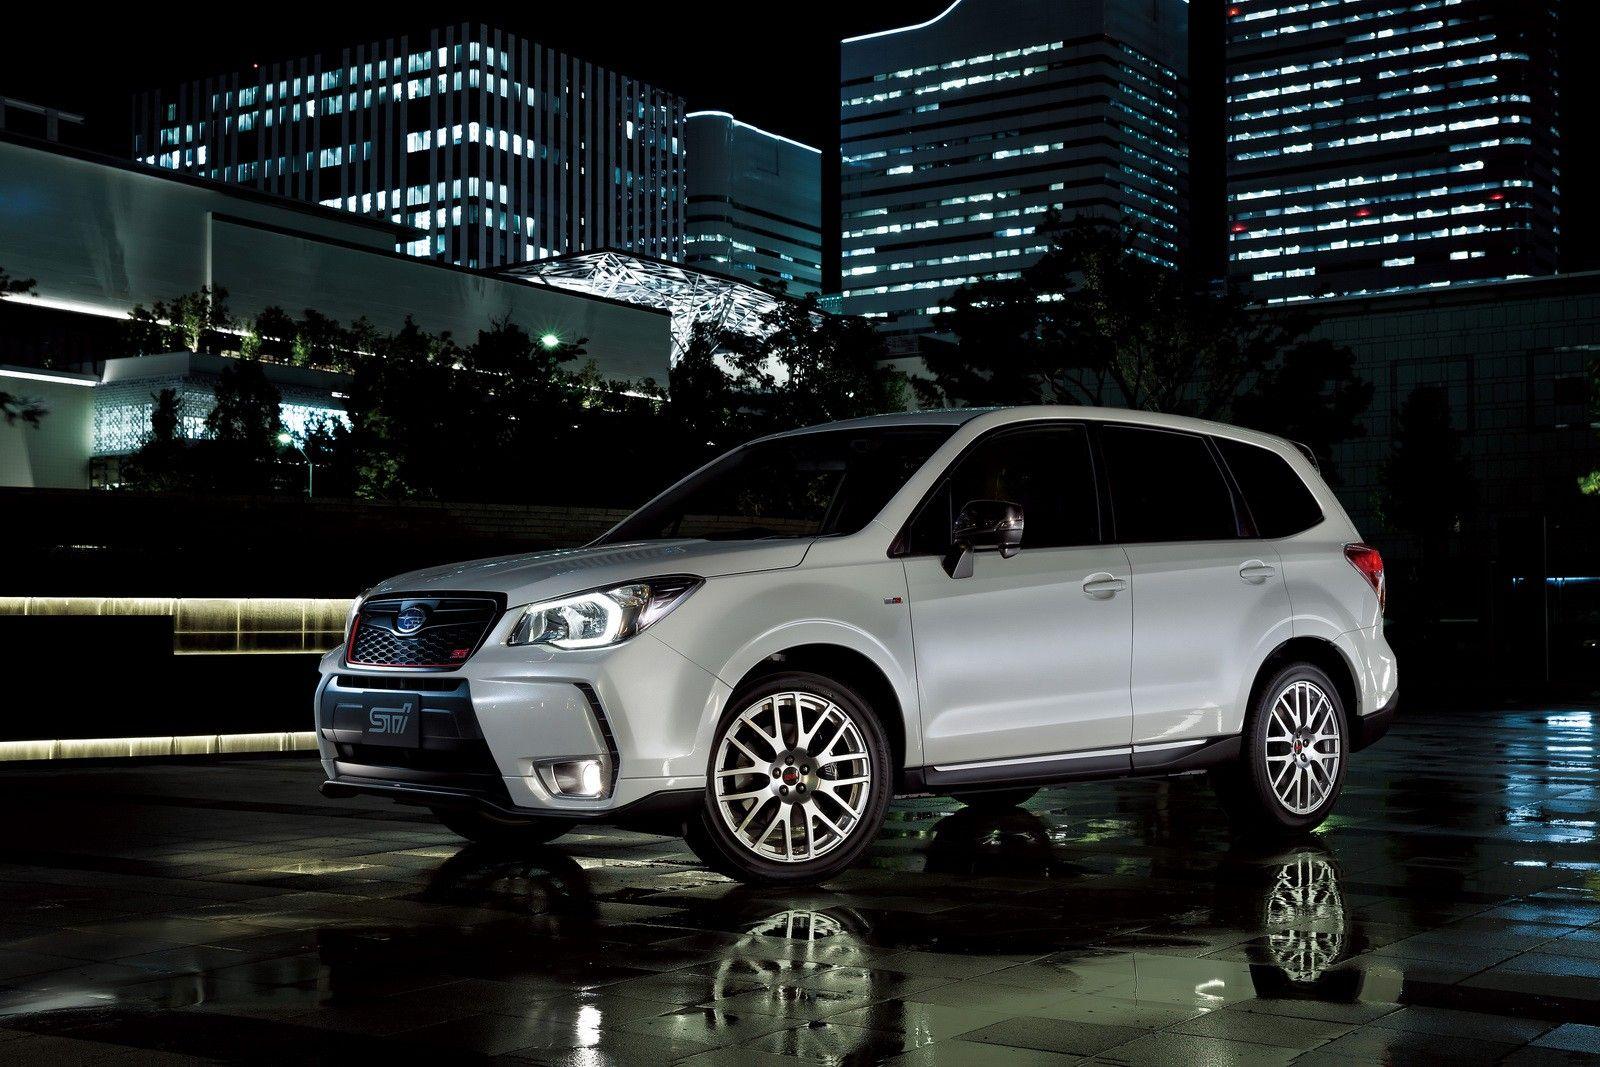 Subaru 2015 subaru forester specs : Oh my....this Isn't the 2015 Subaru Forester STI, Just a Japan ...